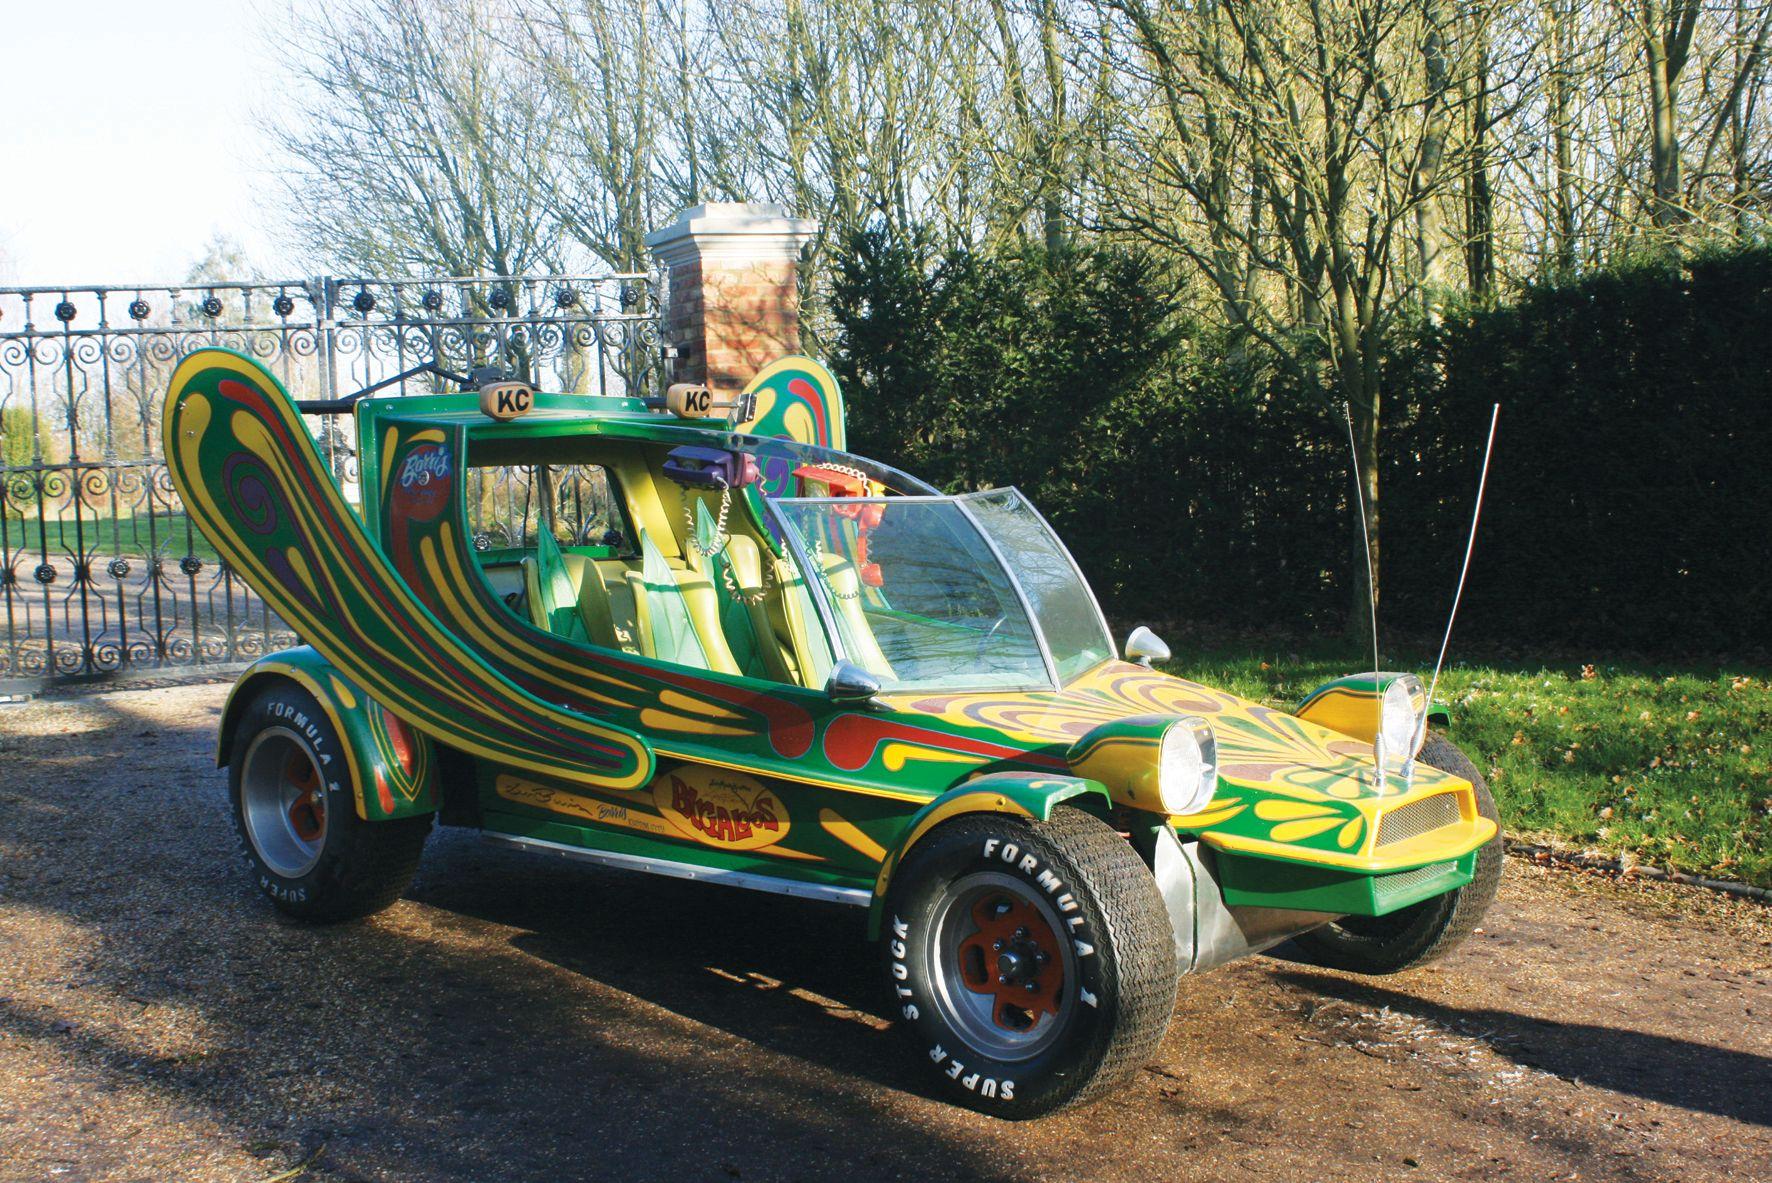 Whacky Custom Cars For Sale | Pinterest | Custom cars, Cars and Vehicle